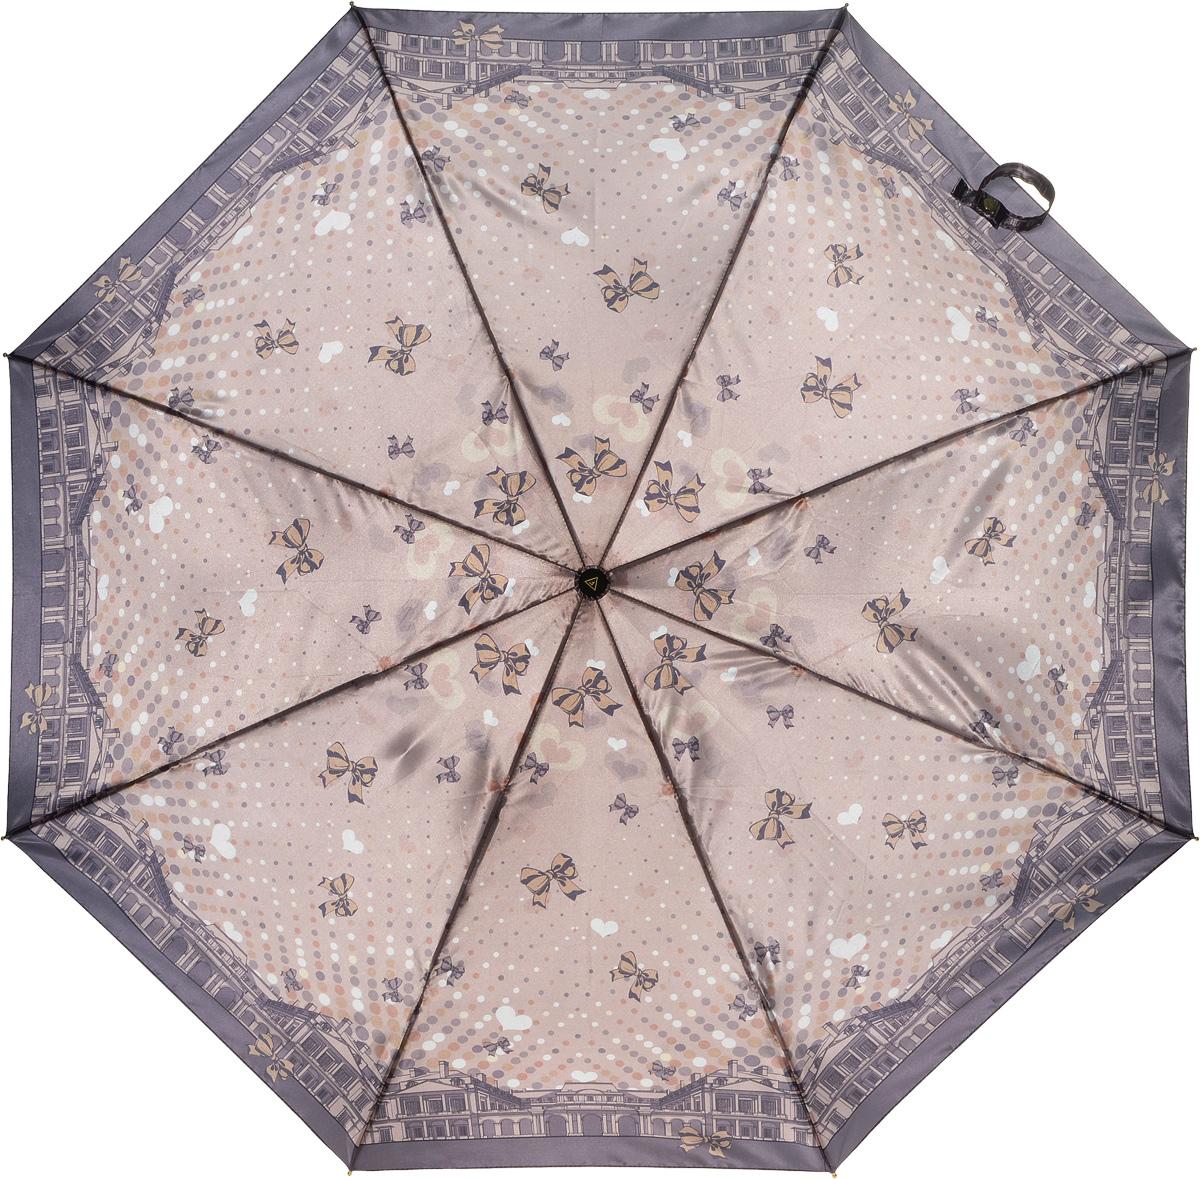 Зонт женский Fabretti, автомат, 3 сложения. L-16107-3L-16107-3Зонт женский Fabretti, облегченный суперавтомат, 3 сложения